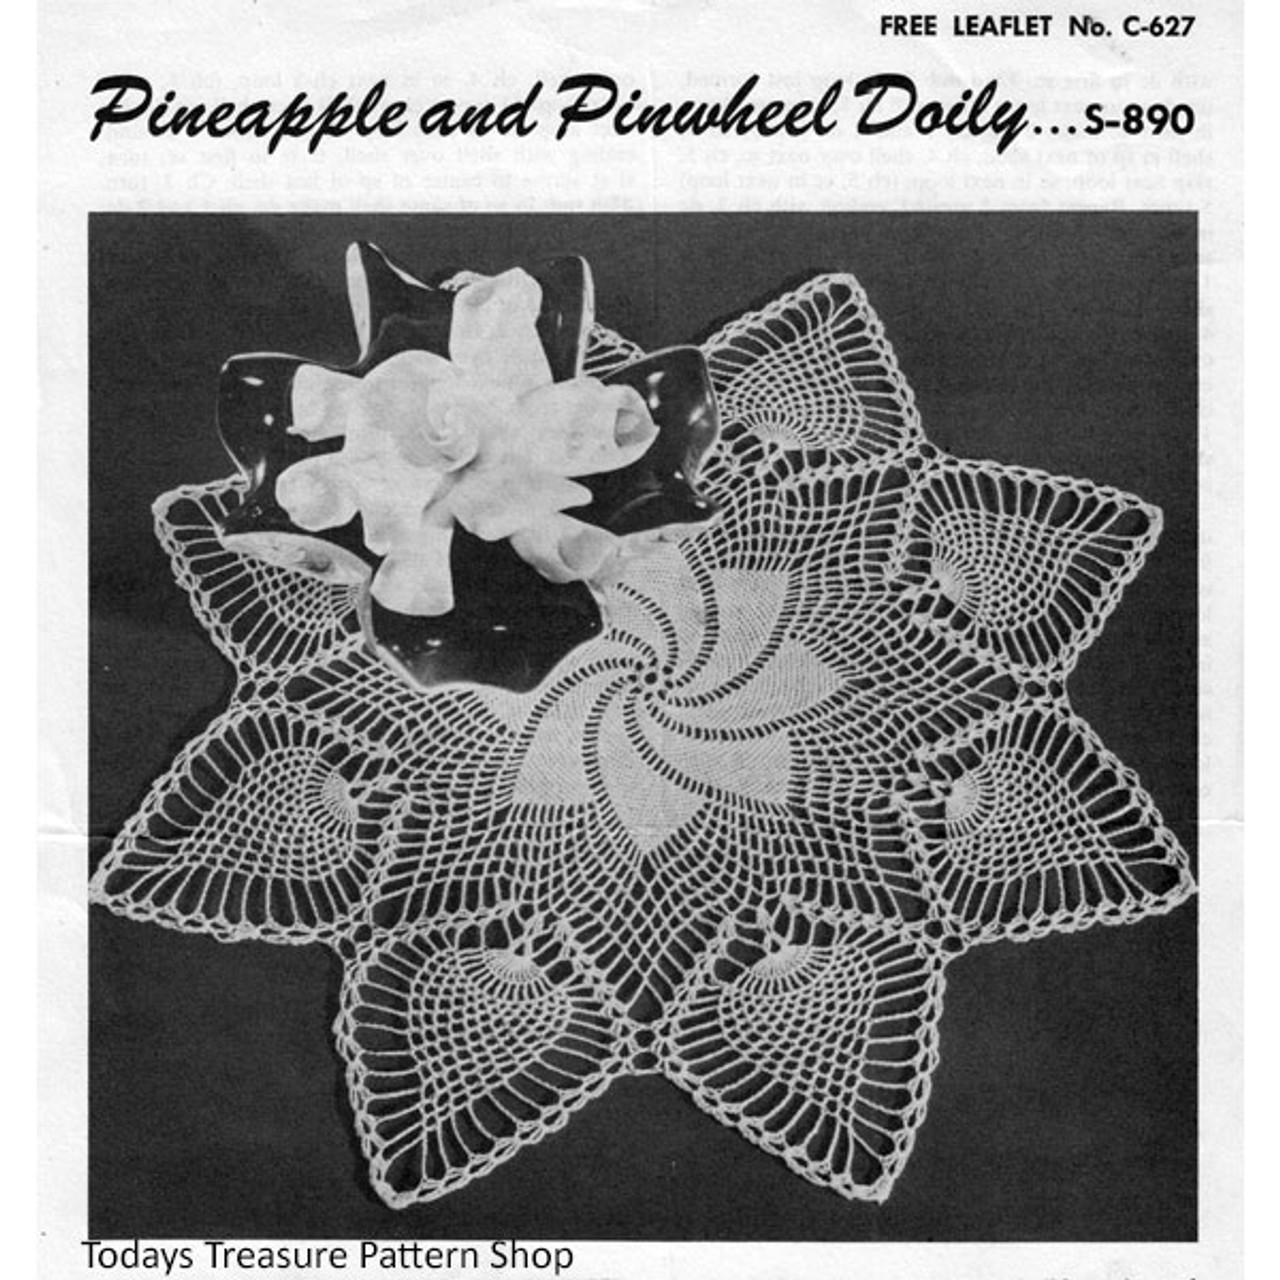 Vintage Crochet Pinwheel Doily Pattern with Pineapple Border